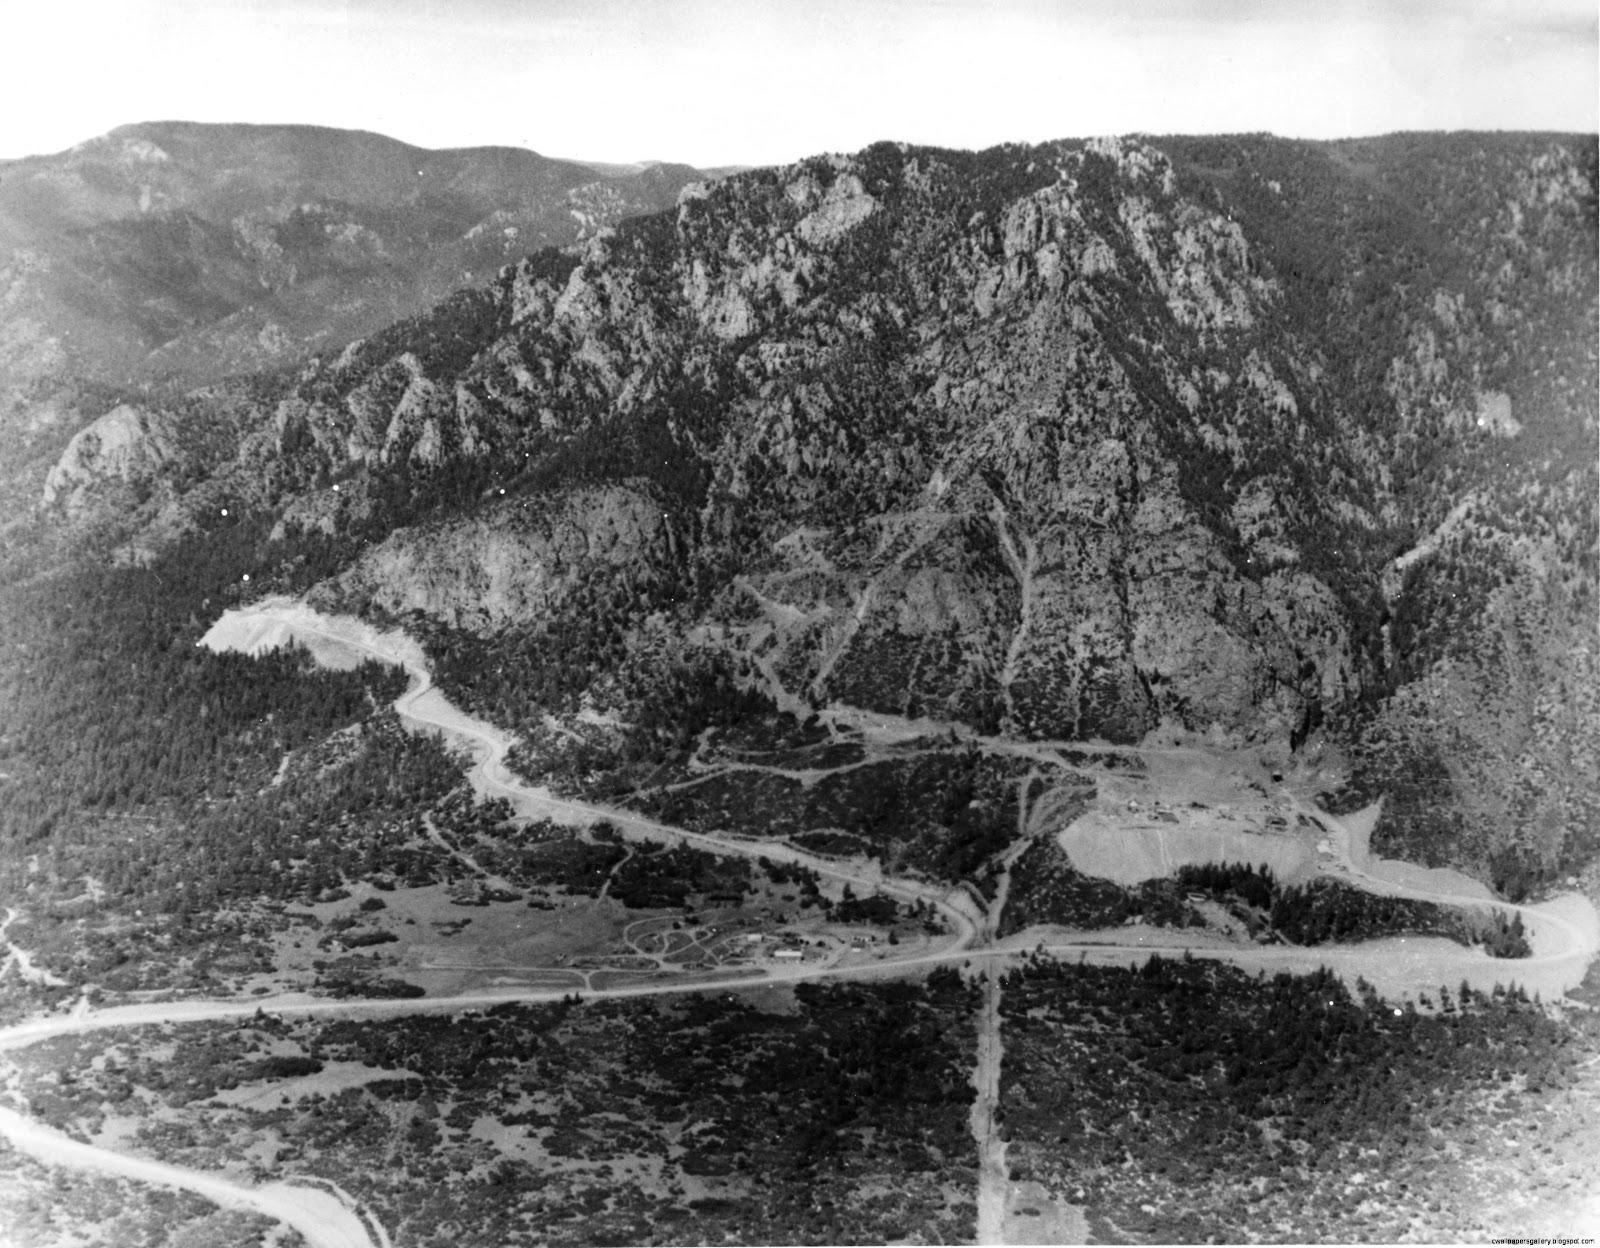 Cheyenne Mountain NORAD Colorado Springs